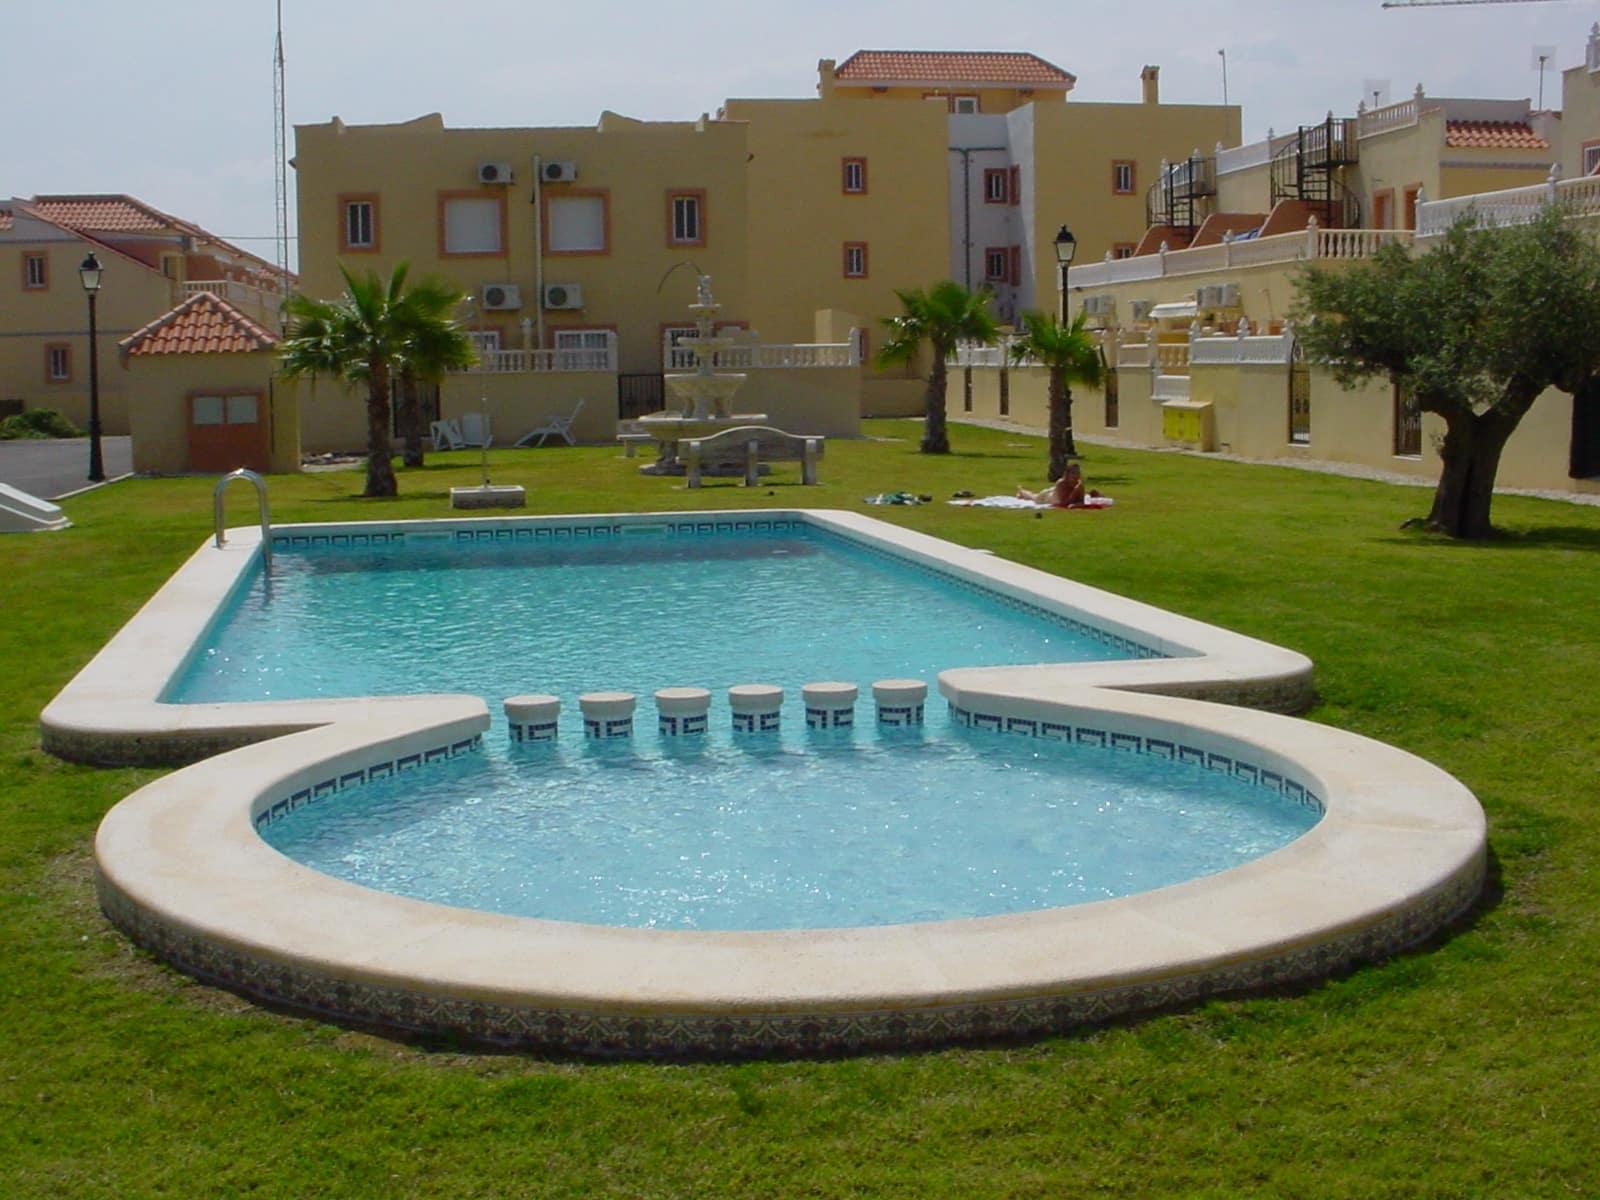 2 sovrum Bungalow att hyra i La Zenia med pool - 600 € (Ref: 4282282)